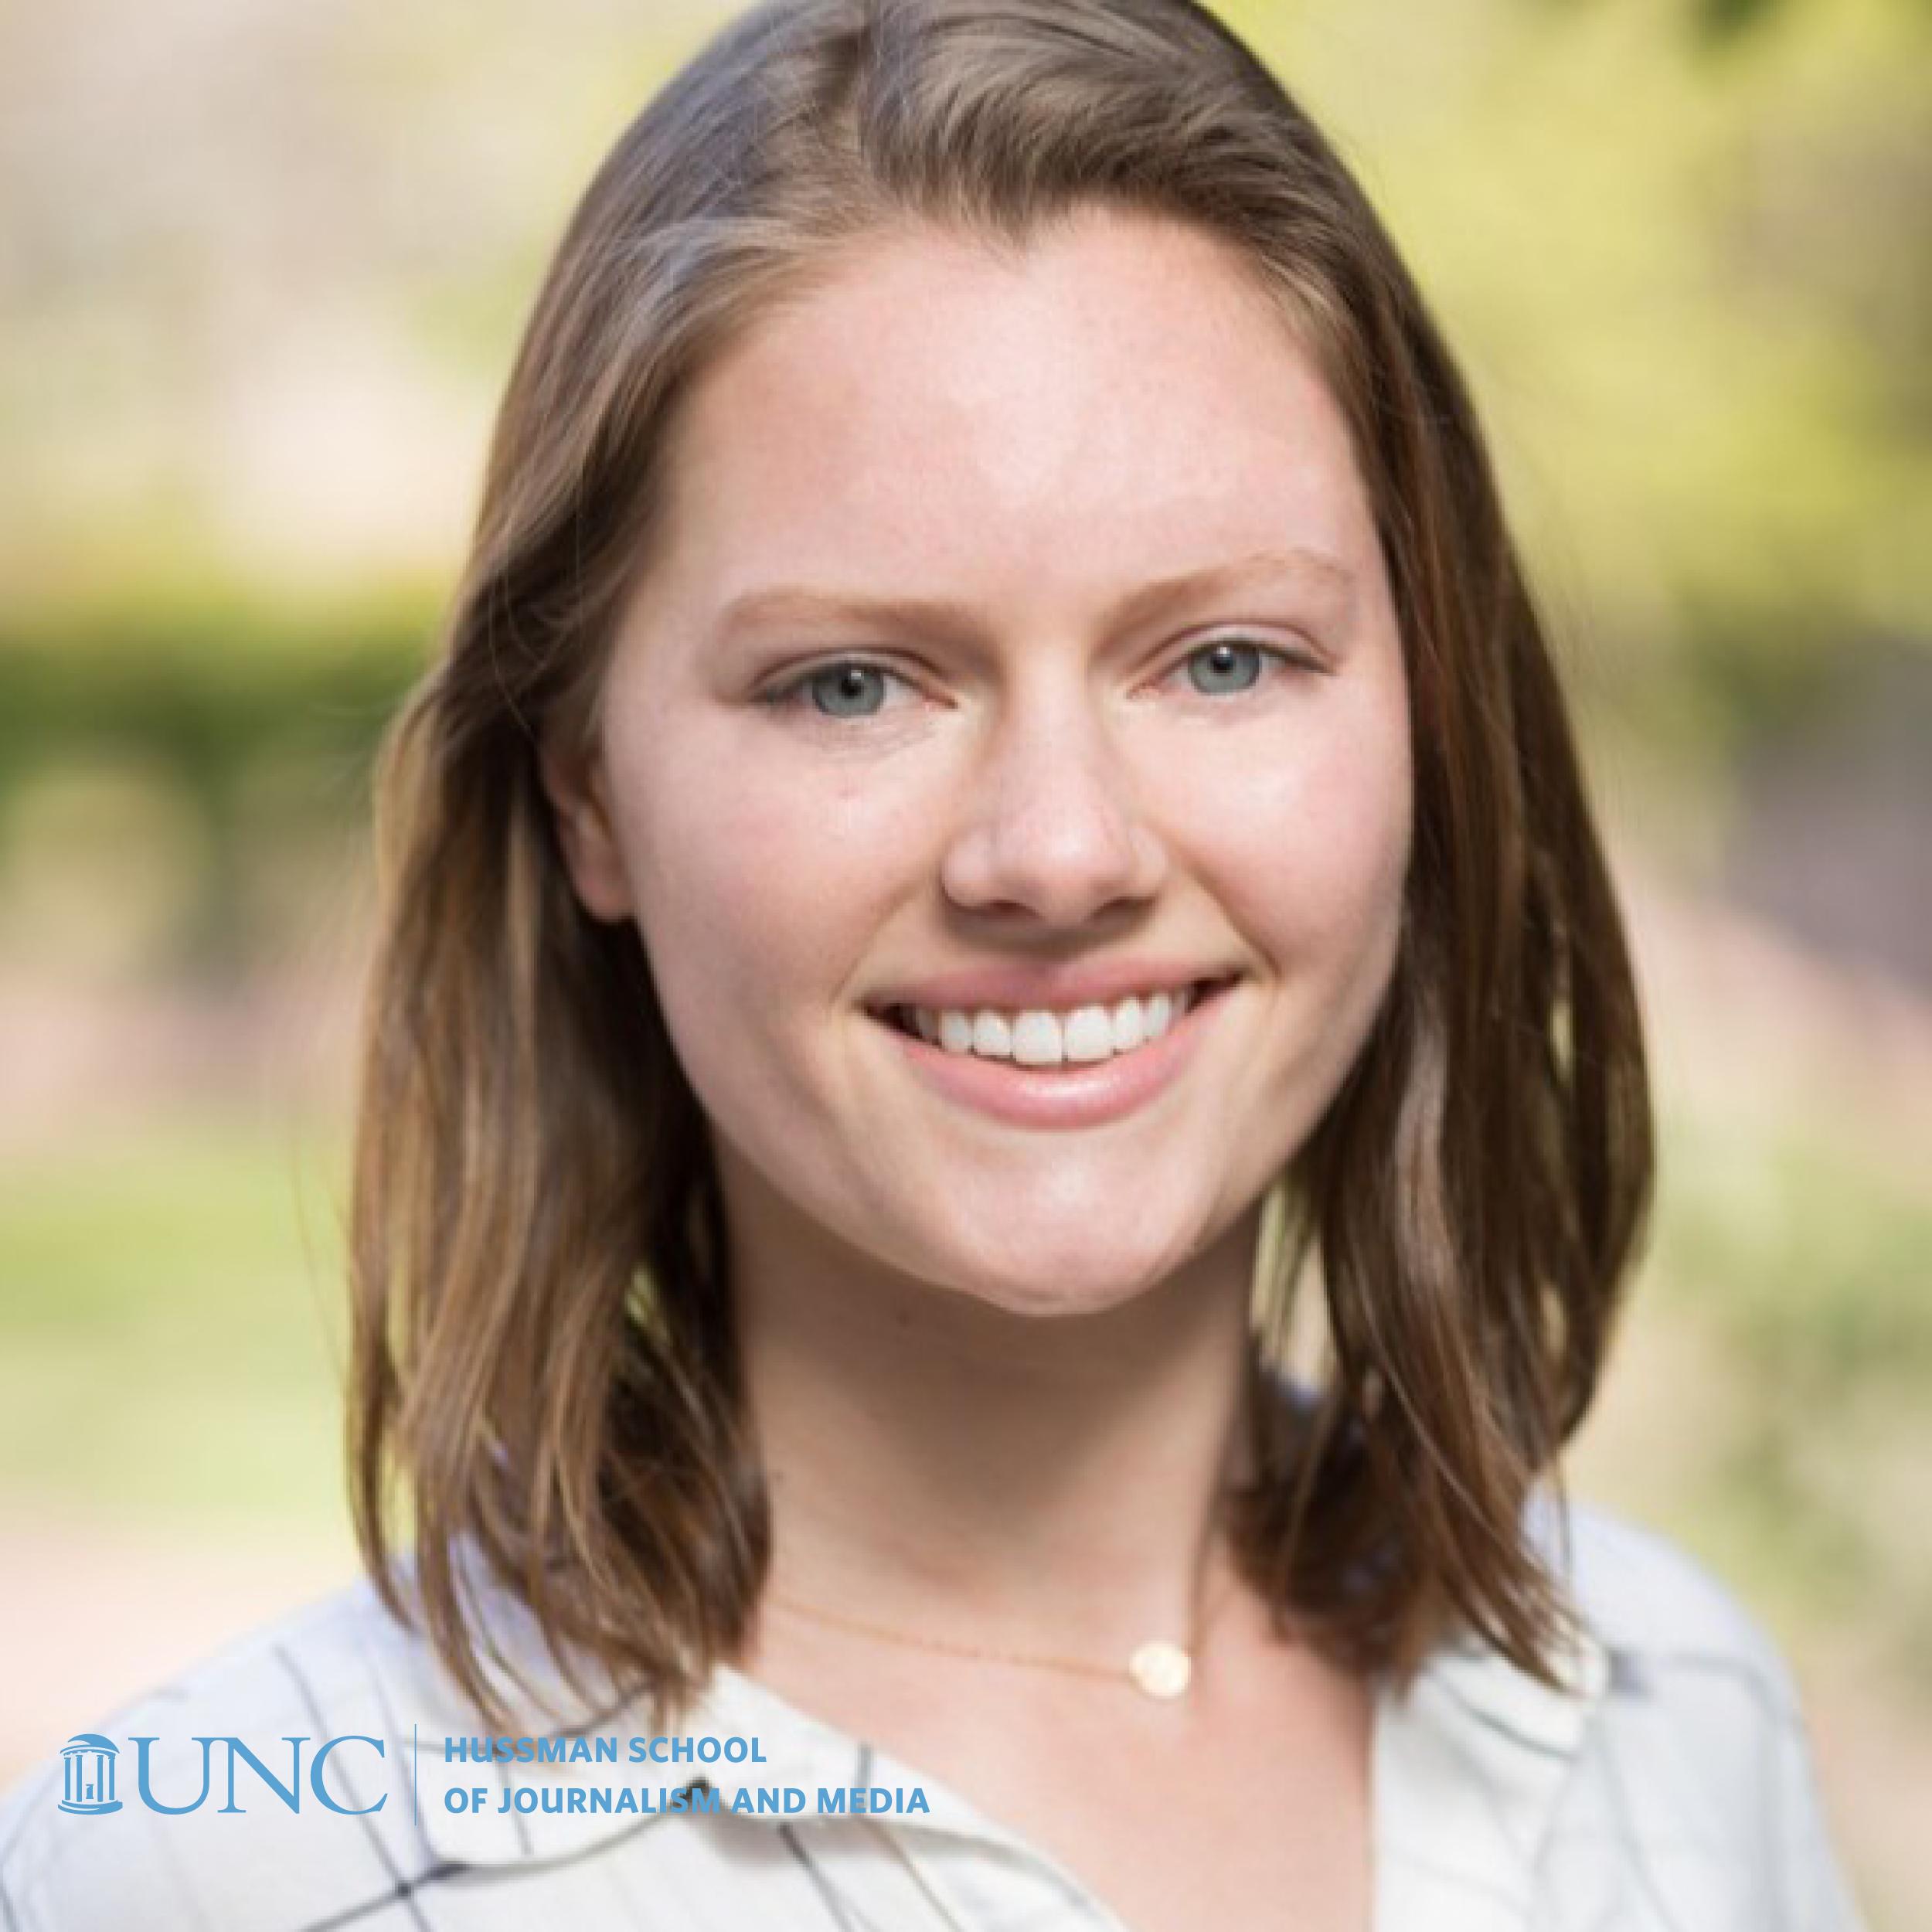 UNC Hussman rising junior Elizabeth Moore '22.